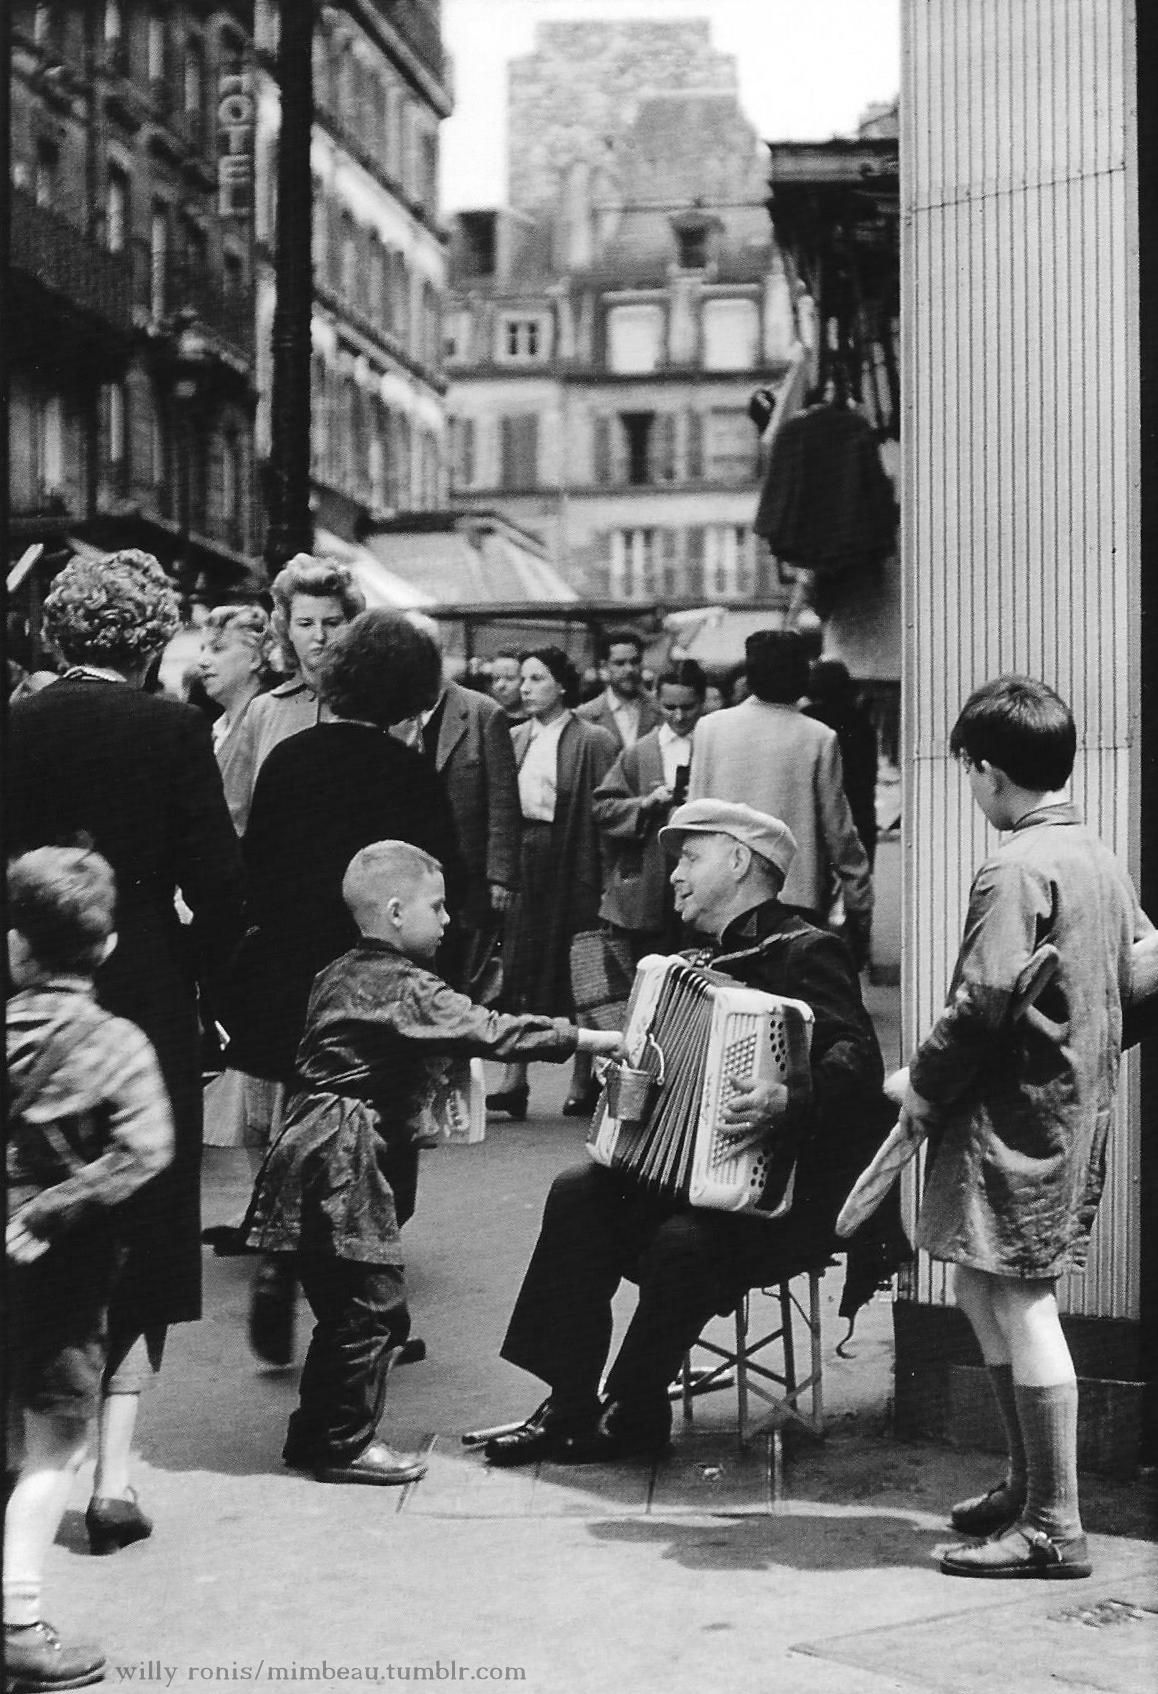 street musicians rue lepic montmartre paris 1955 willy ronis noir et blanc pinterest. Black Bedroom Furniture Sets. Home Design Ideas